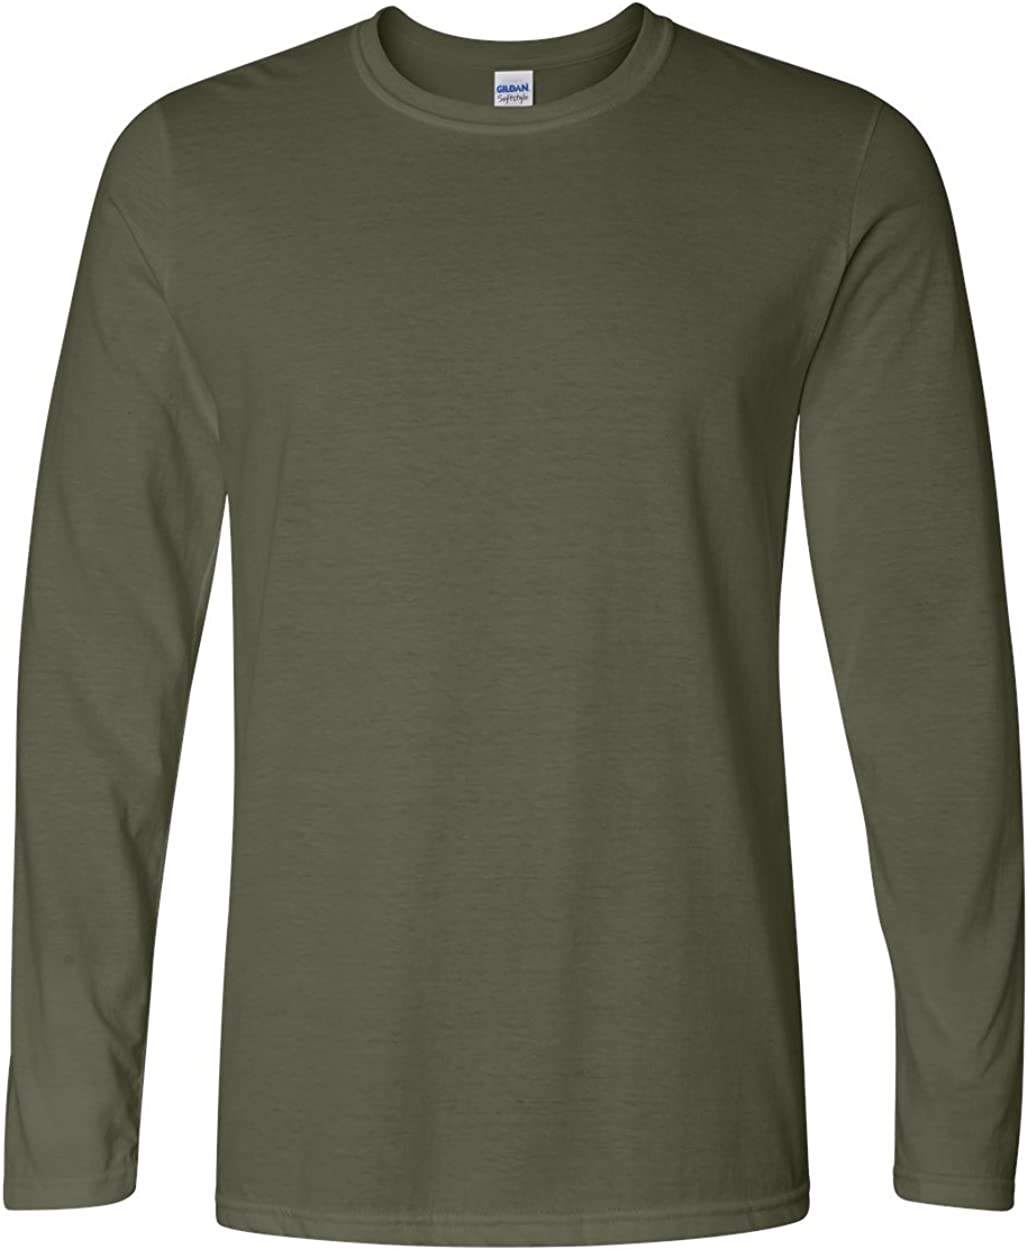 Gildan Herren T-Shirt Ultra Cotton Langarm